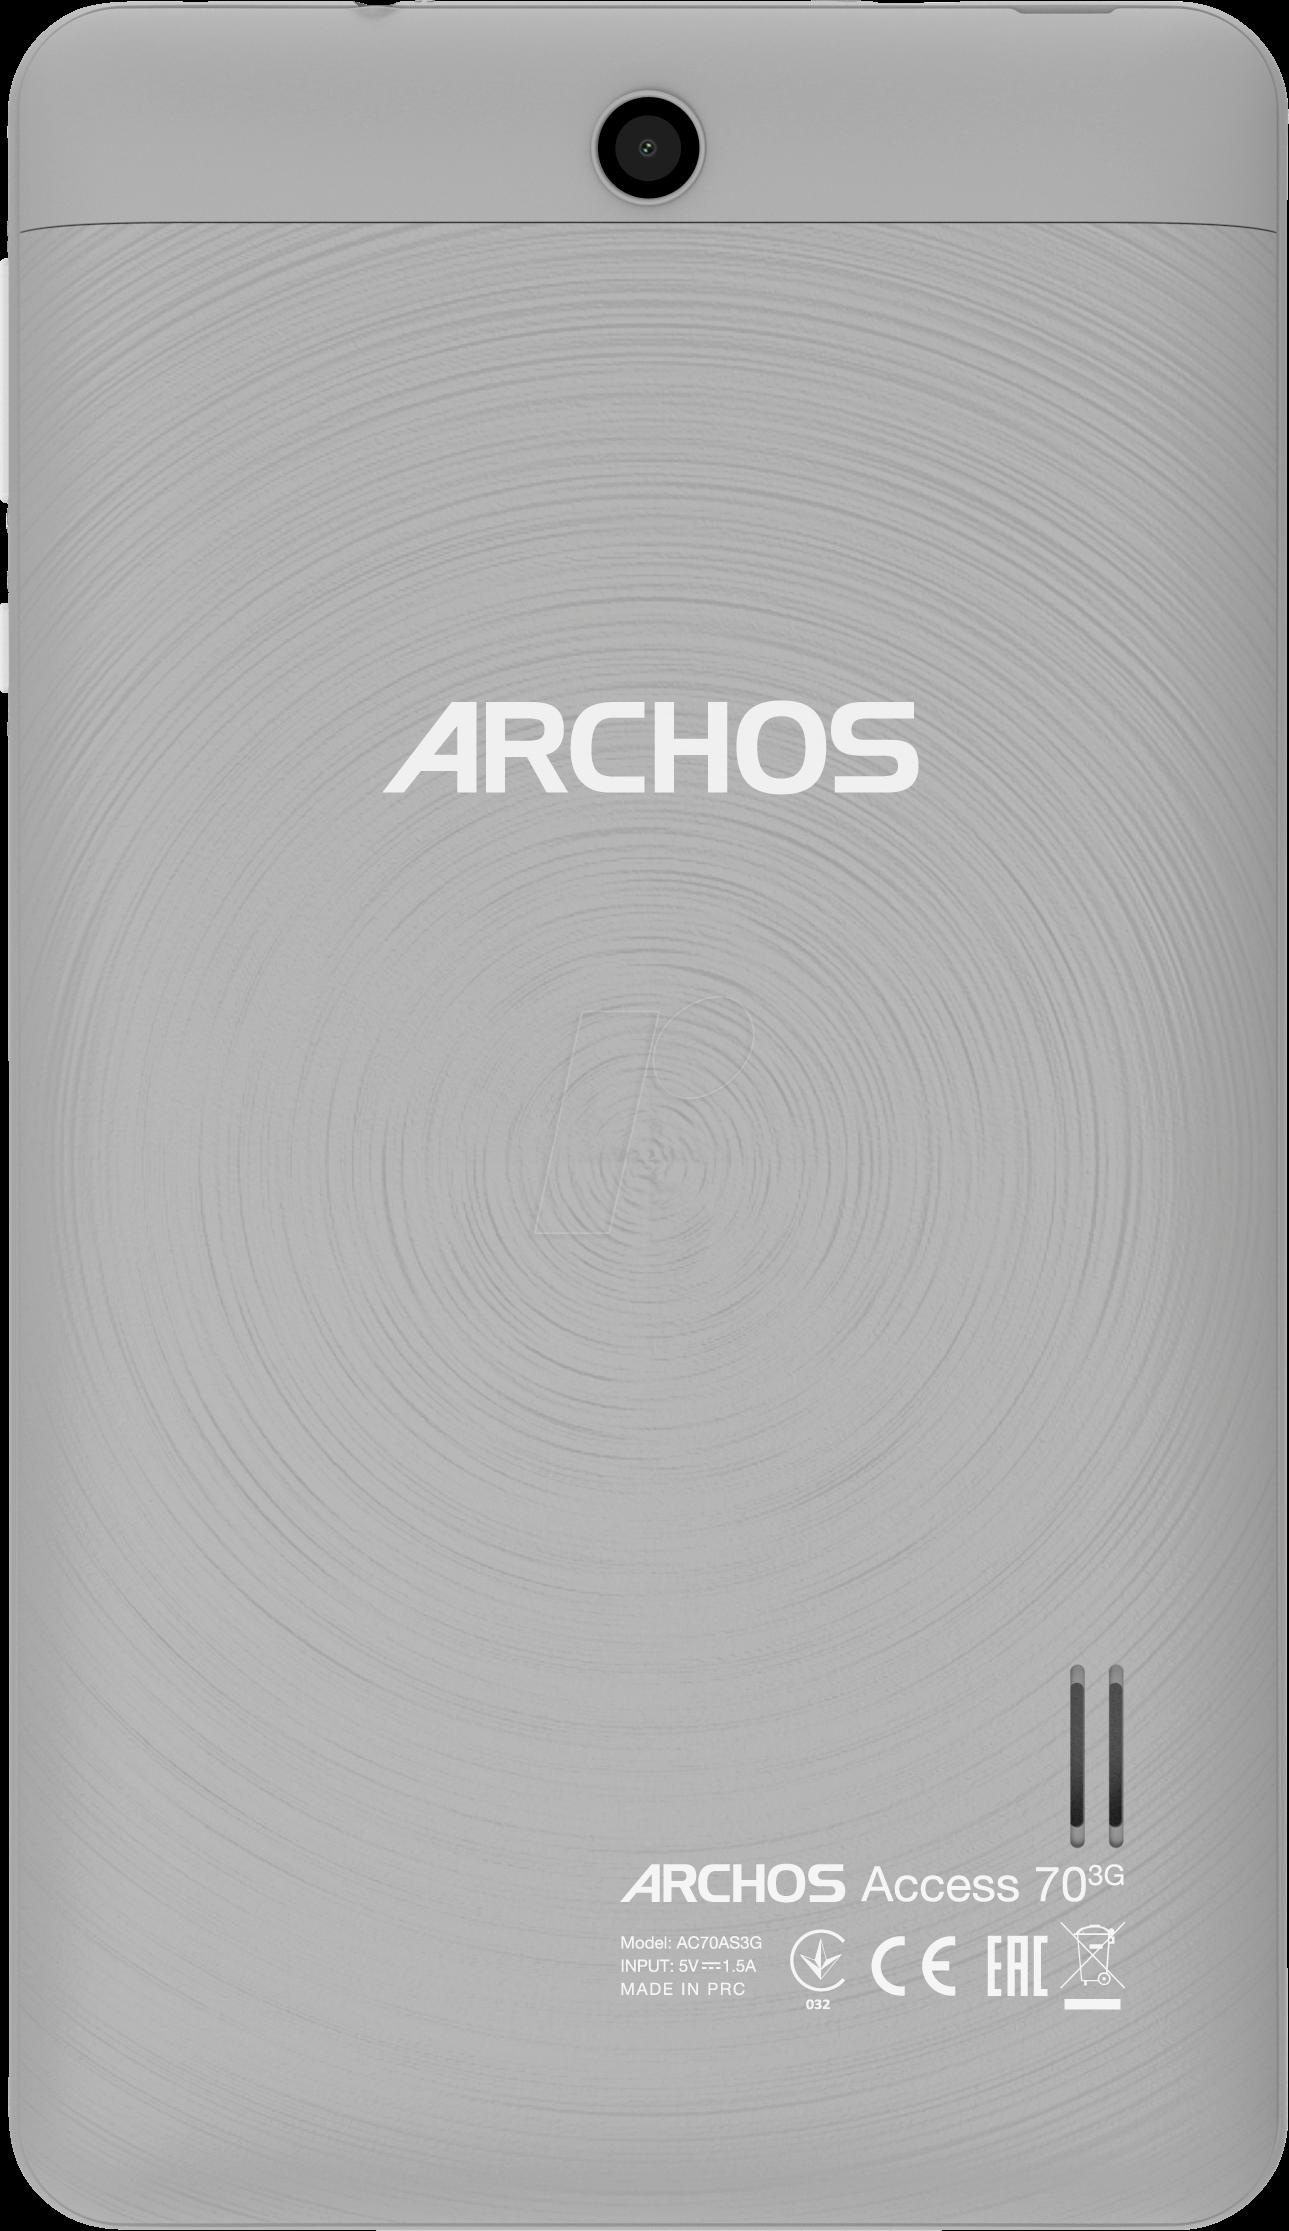 https://cdn-reichelt.de/bilder/web/xxl_ws/E910/ARCHOS_ACC708_03.png